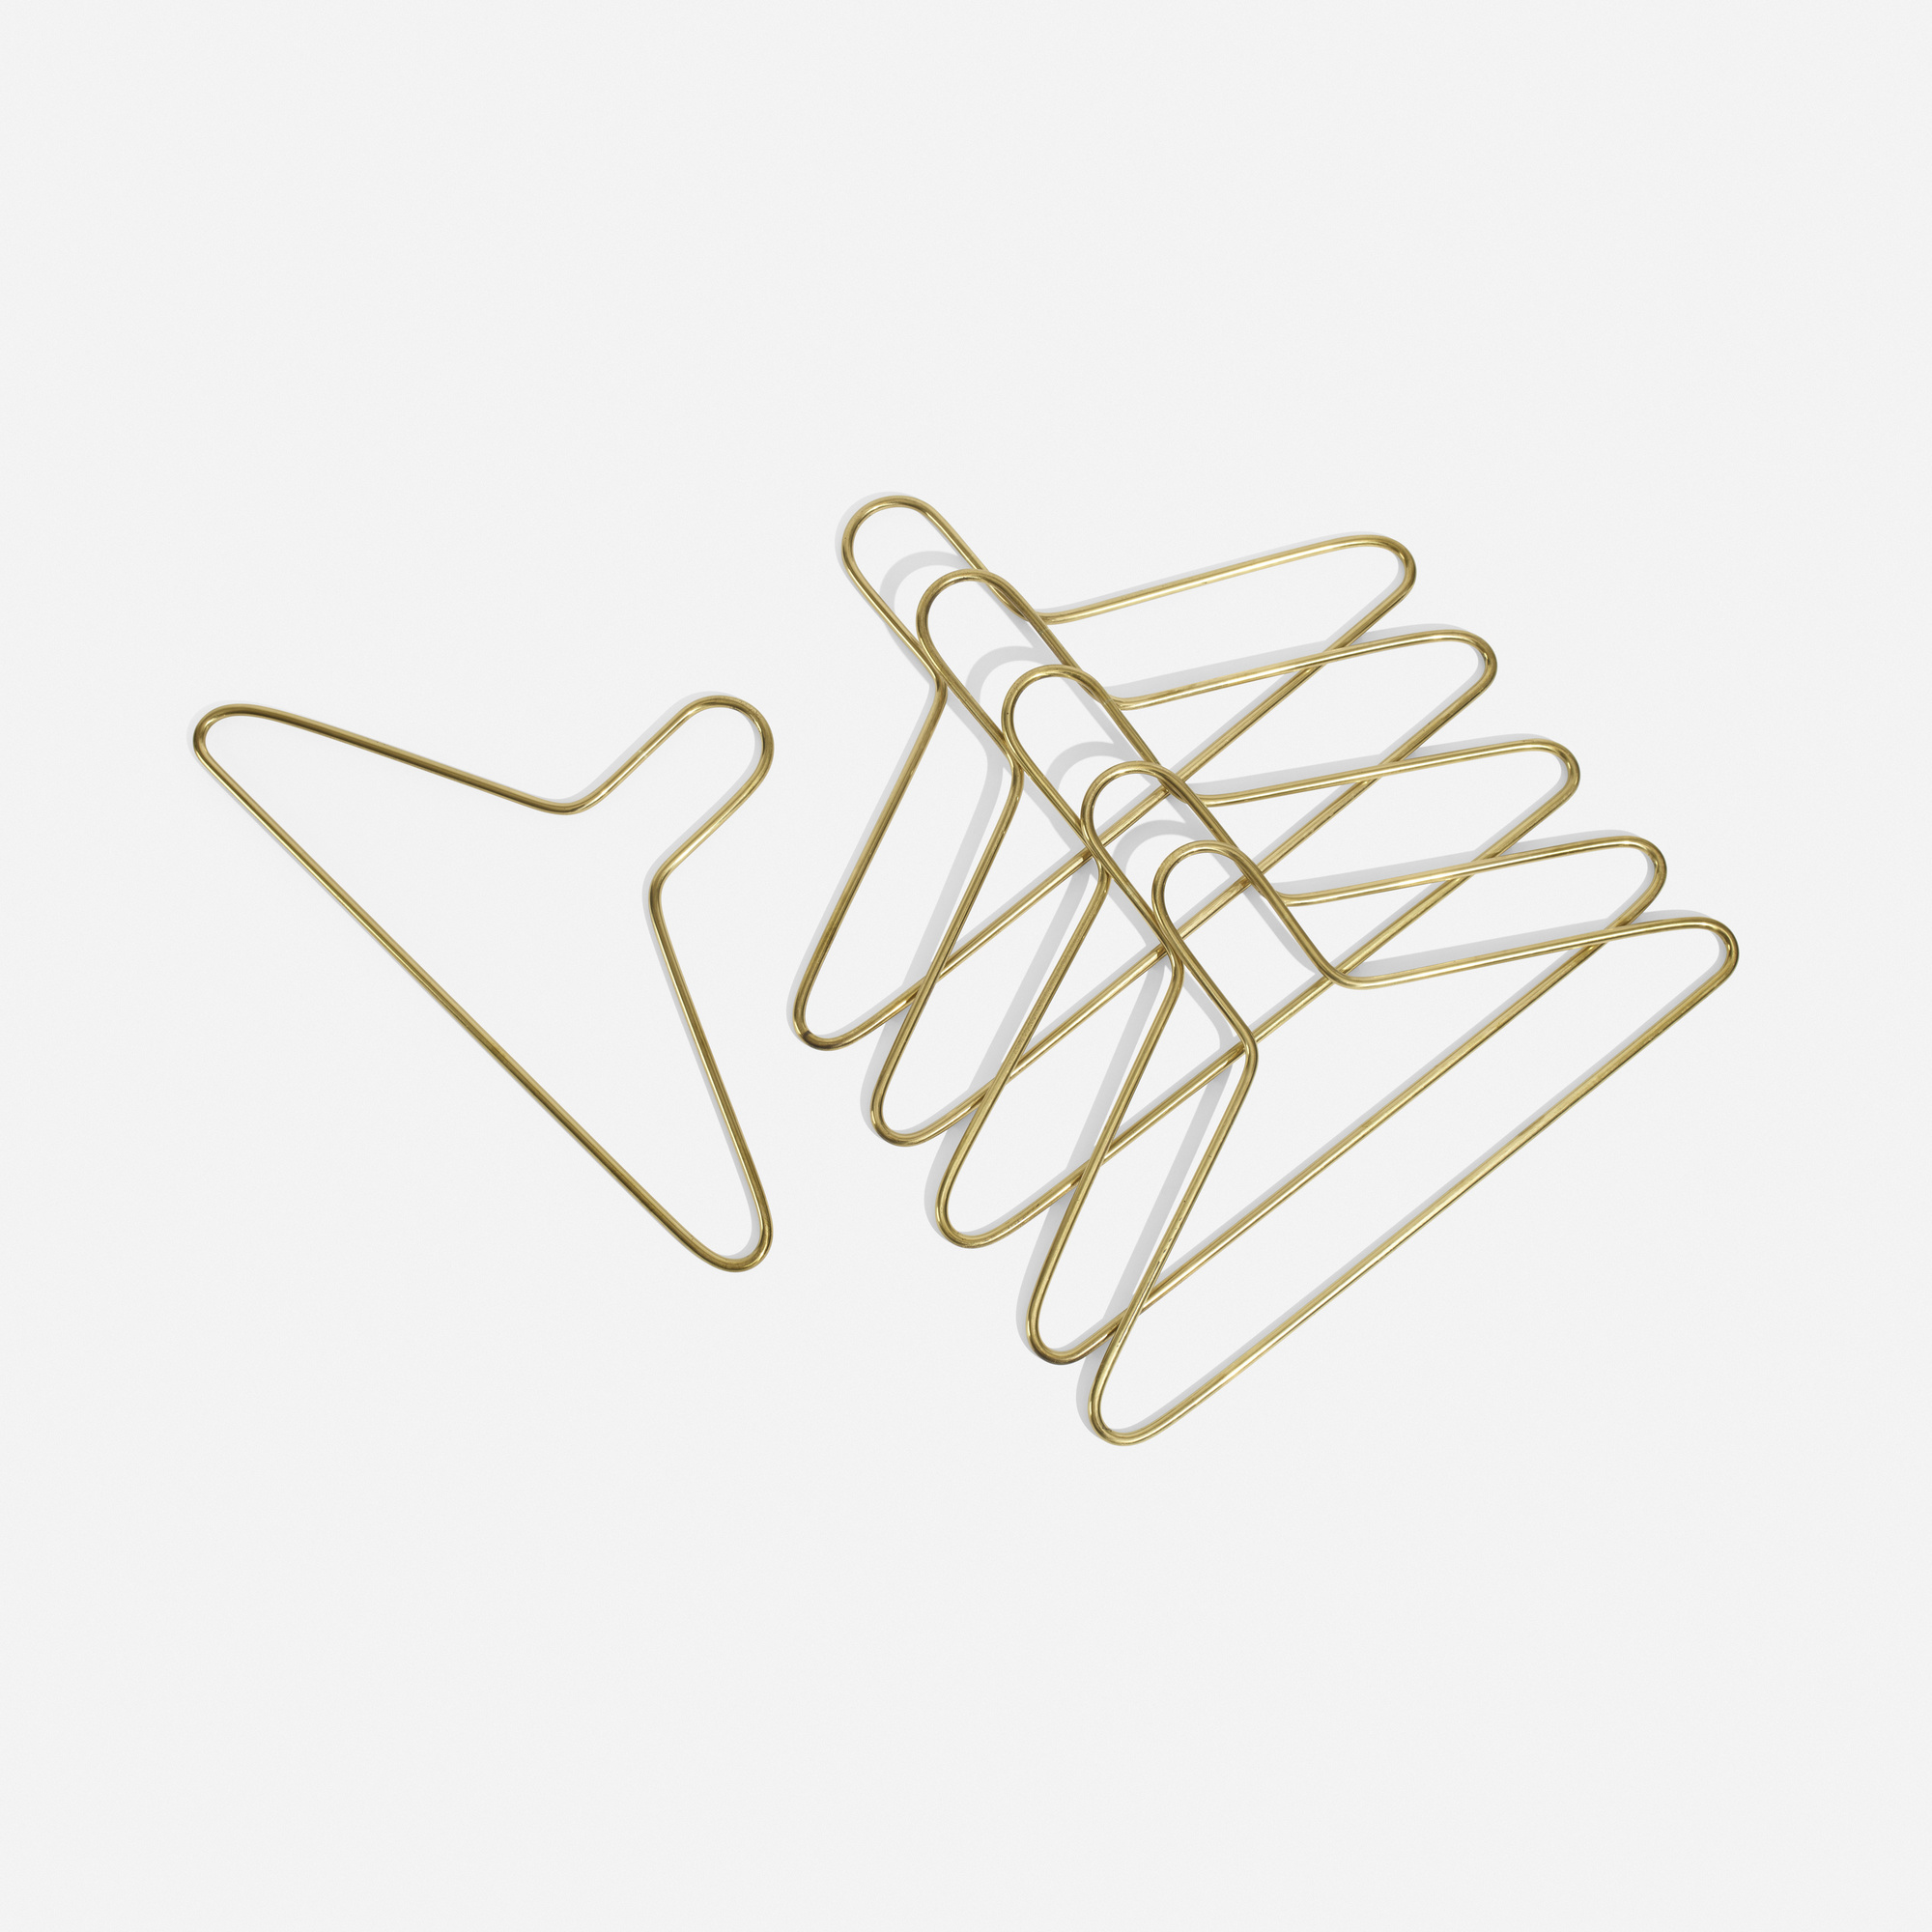 159: Carl Auböck III / coat hangers, set of six (1 of 2)